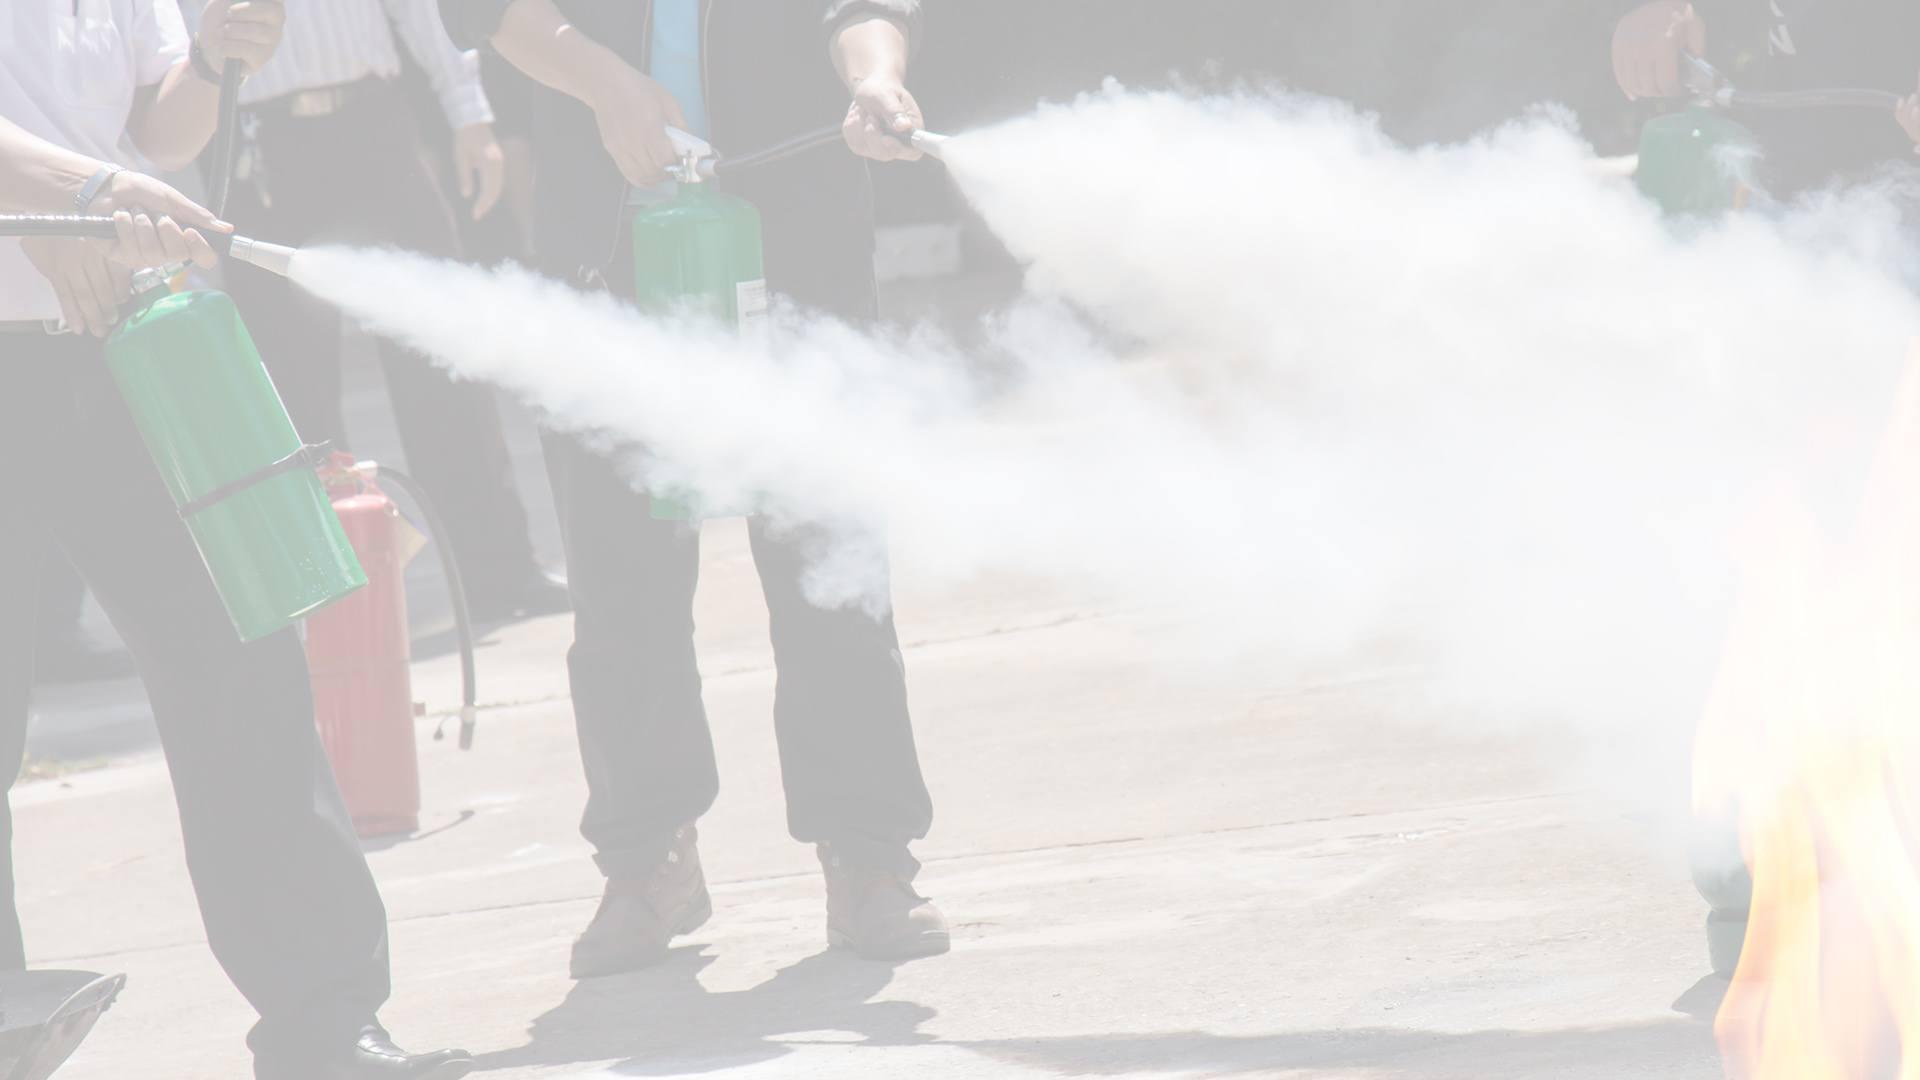 Formation incendie Lyon - Manipulation des extincteurs - PrevInter